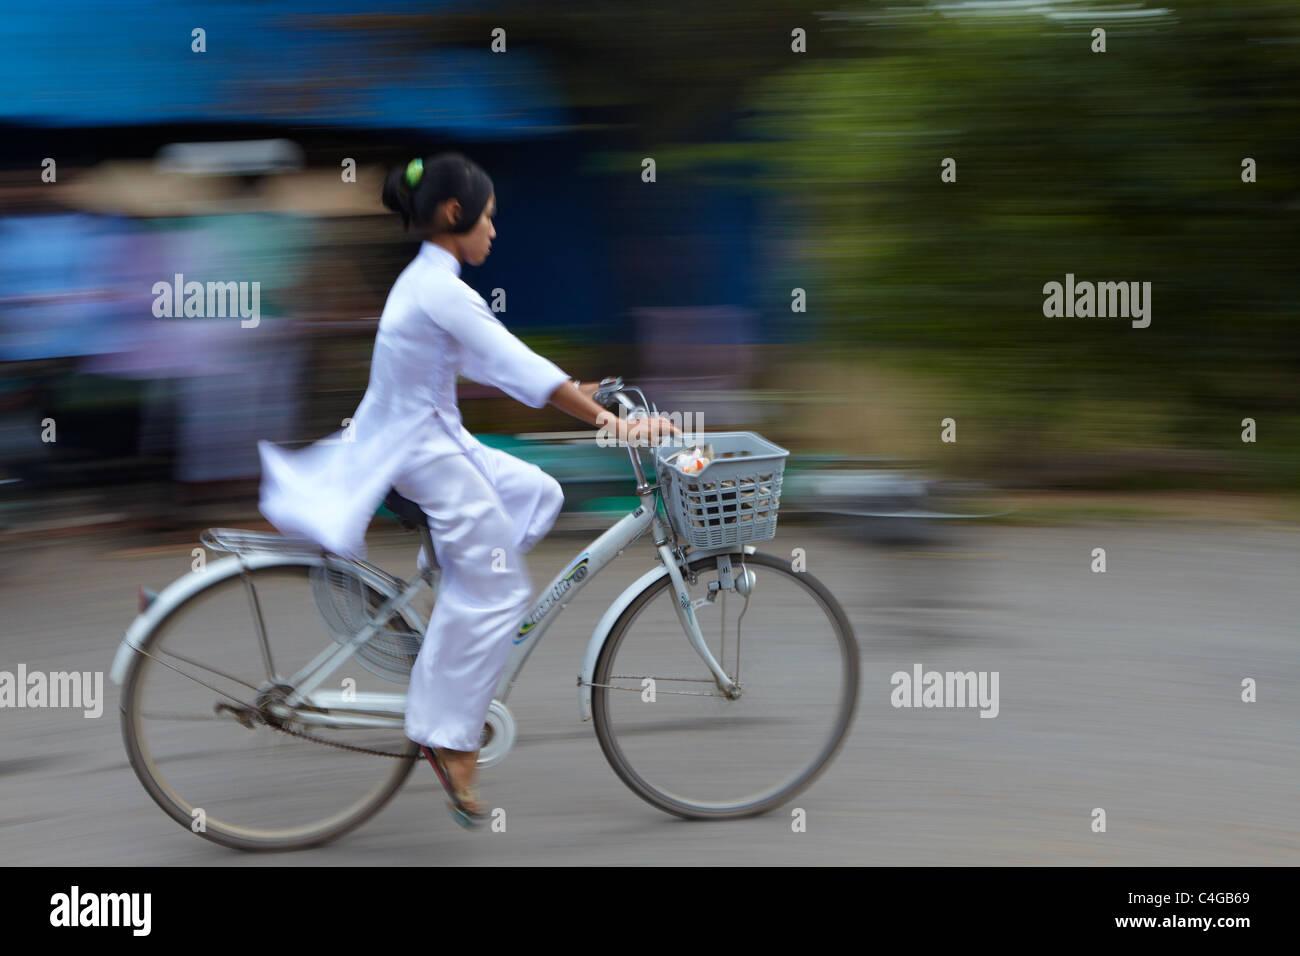 Una niña de Ao Dai en una bicicleta, el delta del Mekong, Vietnam Imagen De Stock